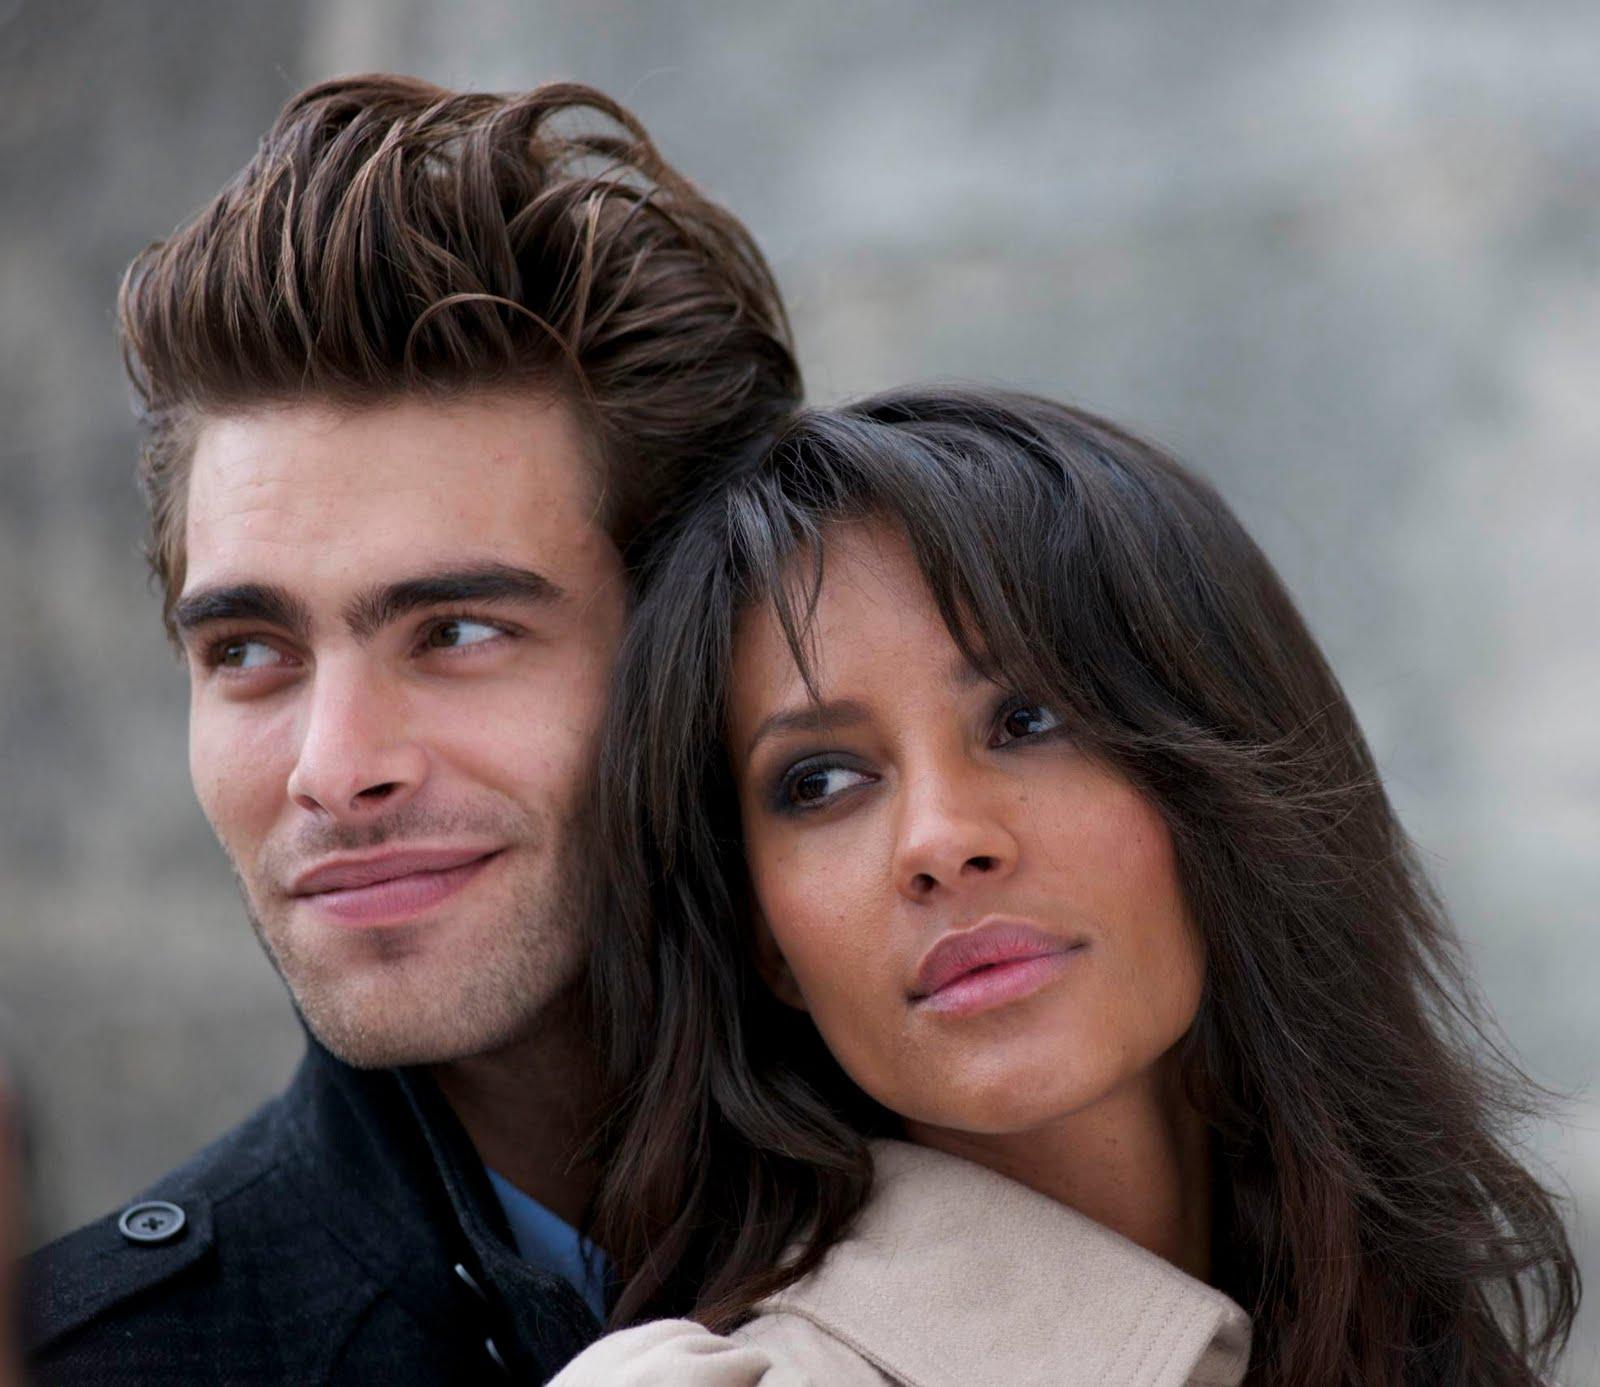 http://2.bp.blogspot.com/-jPyeE9KjmWo/TpzU0EGvxnI/AAAAAAAAAgA/TKtlIVKMxGM/s1600/couple.jpg